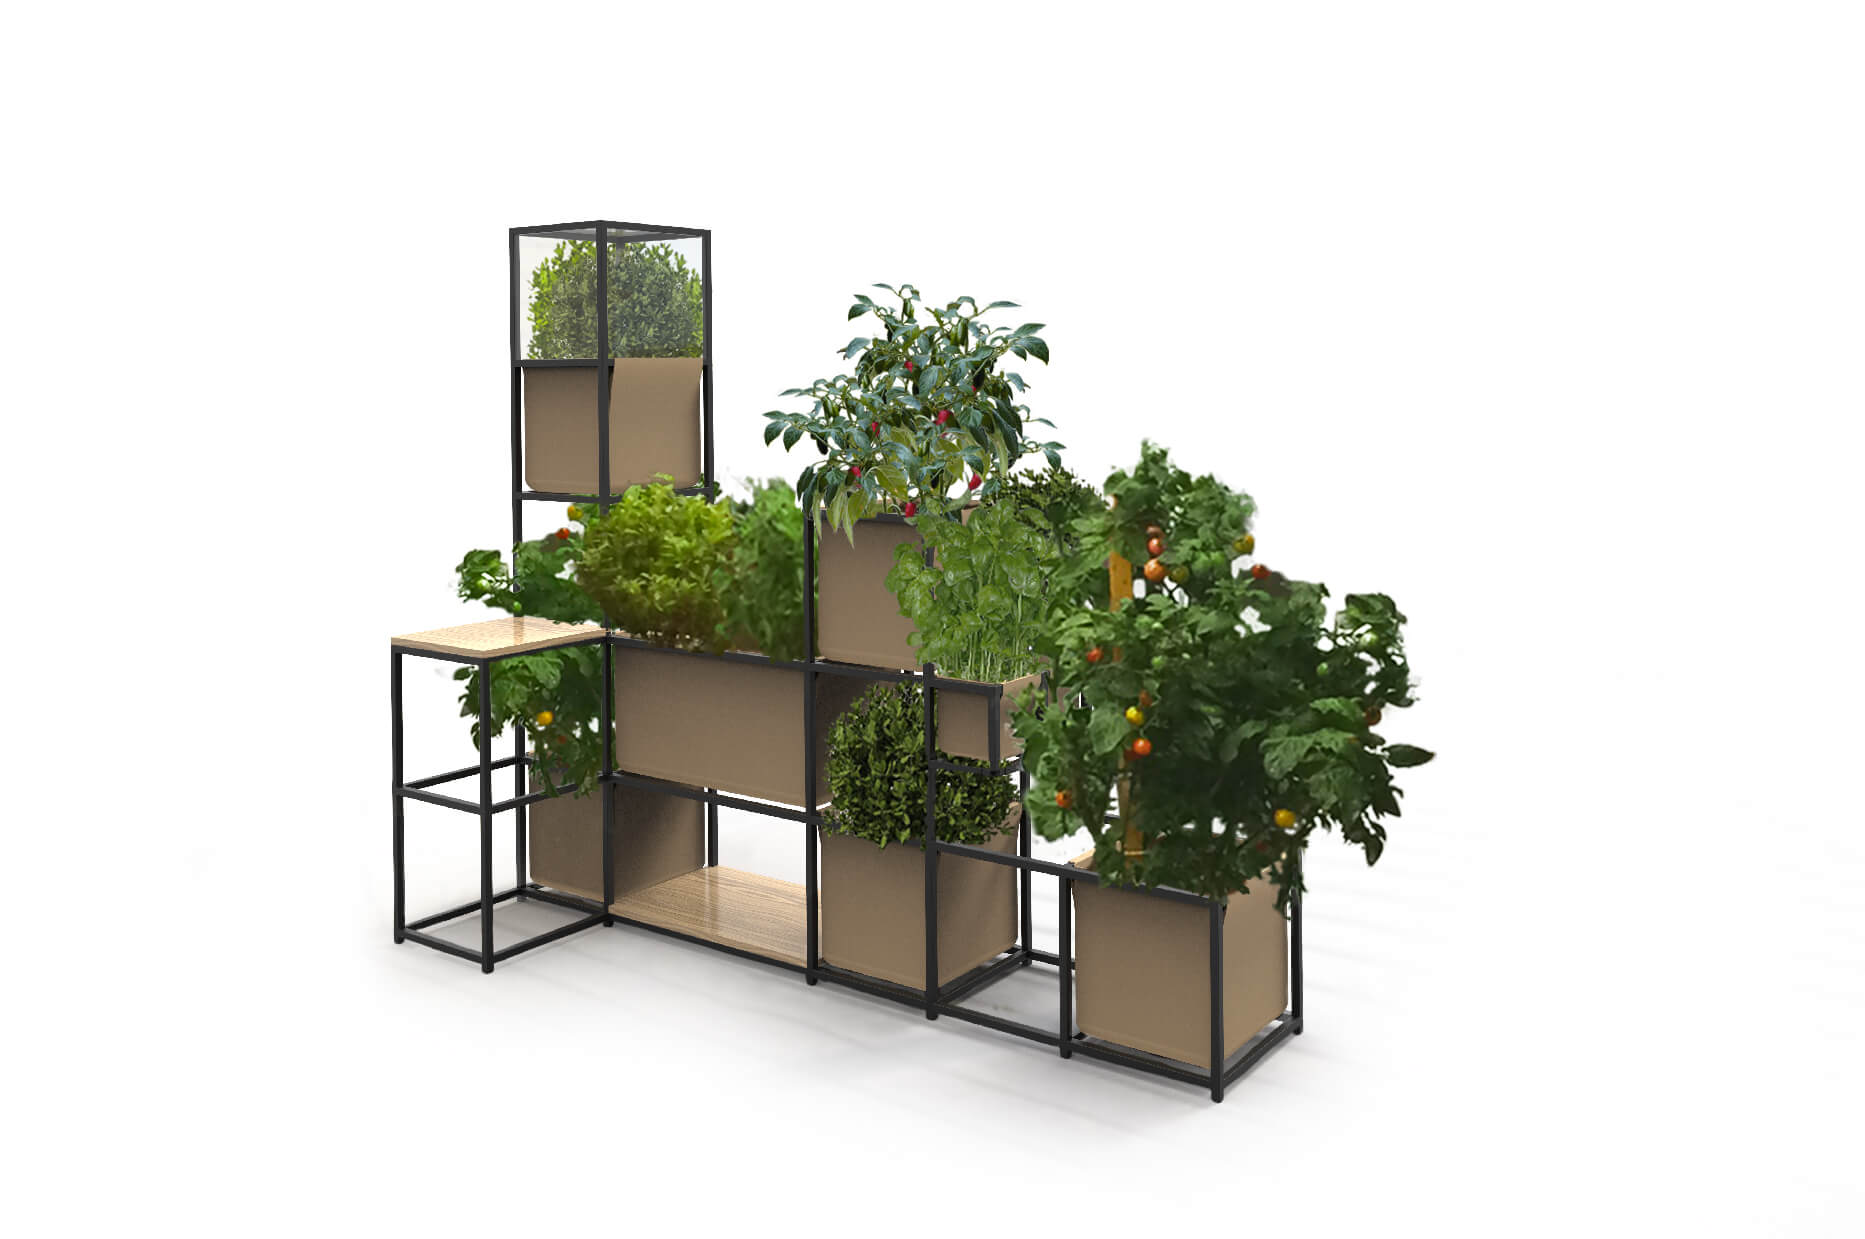 Modulair Garden, une invention « verte » prometteuse